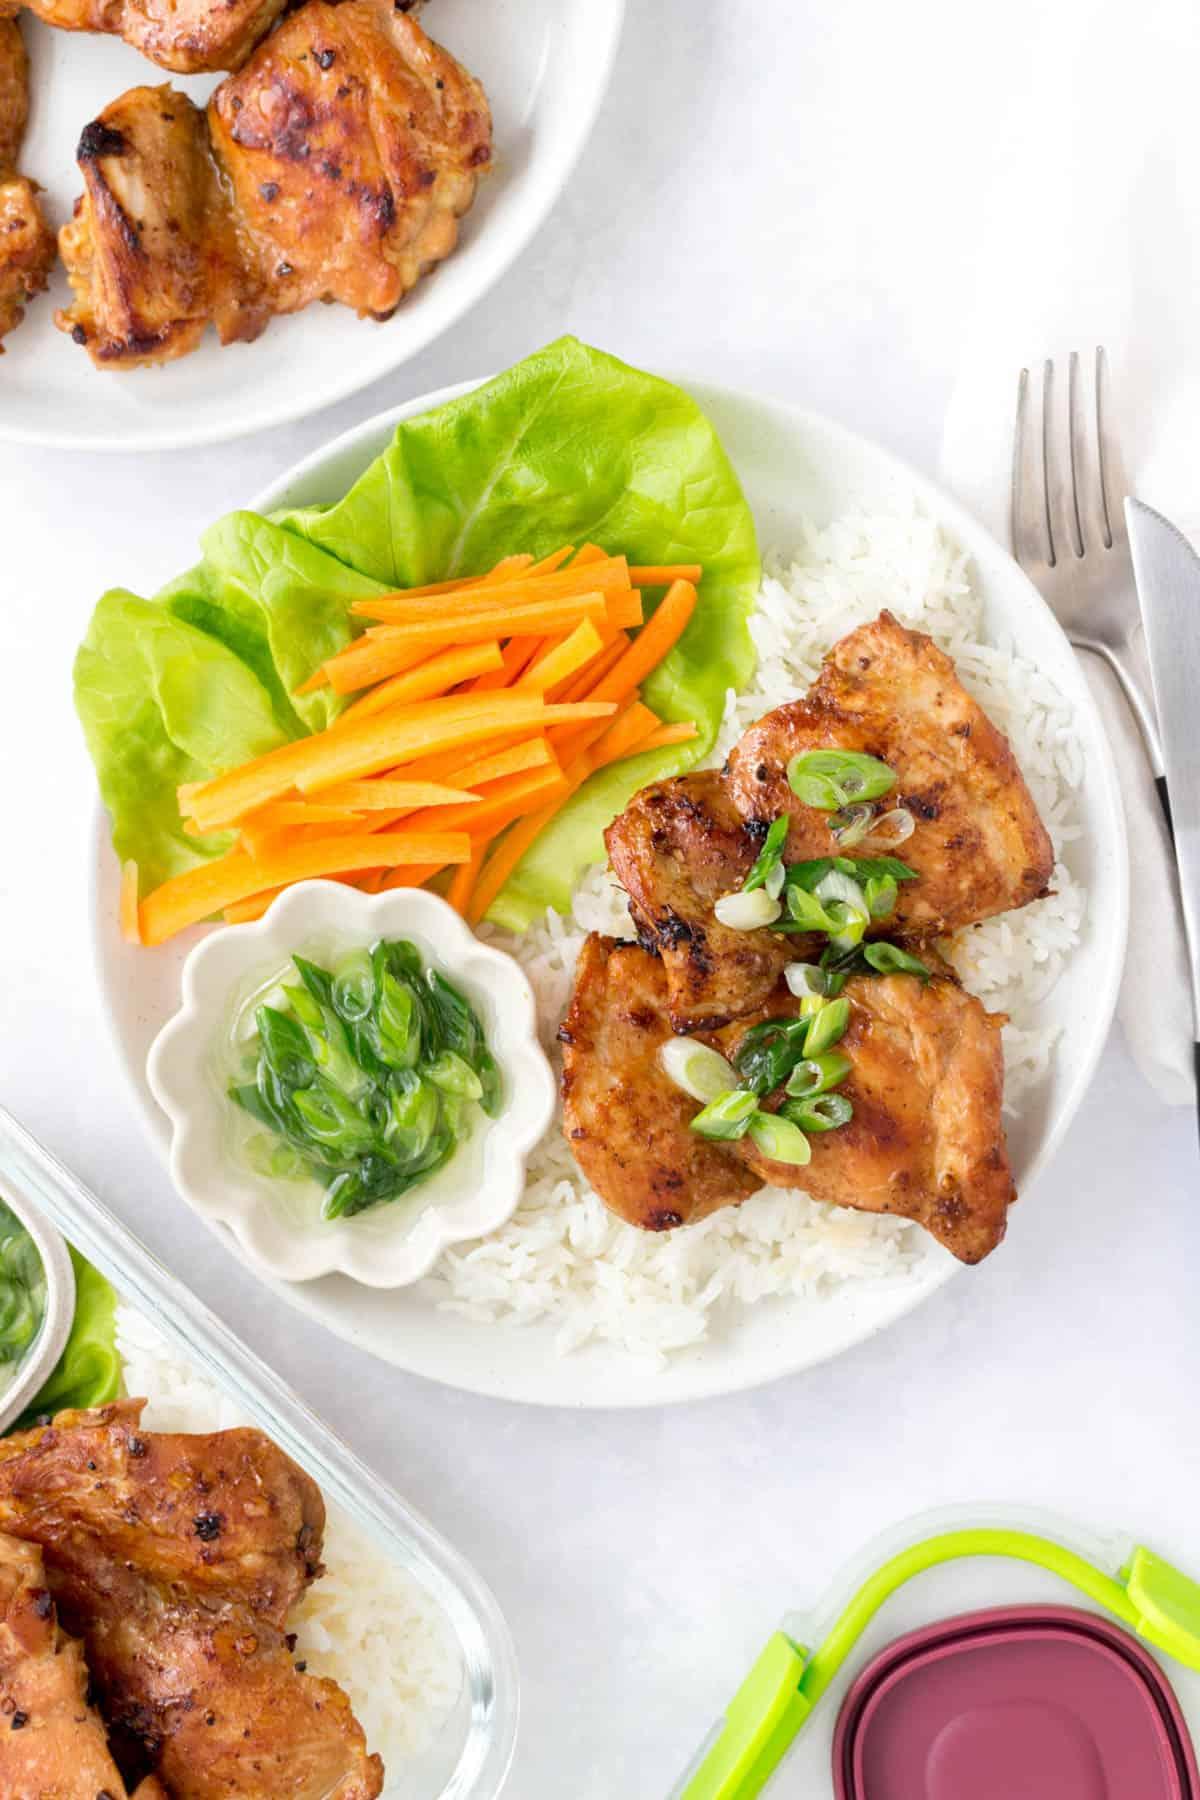 White plate with rice, lemongrass chicken, scallion oil, lettuce, and sliced carrots.